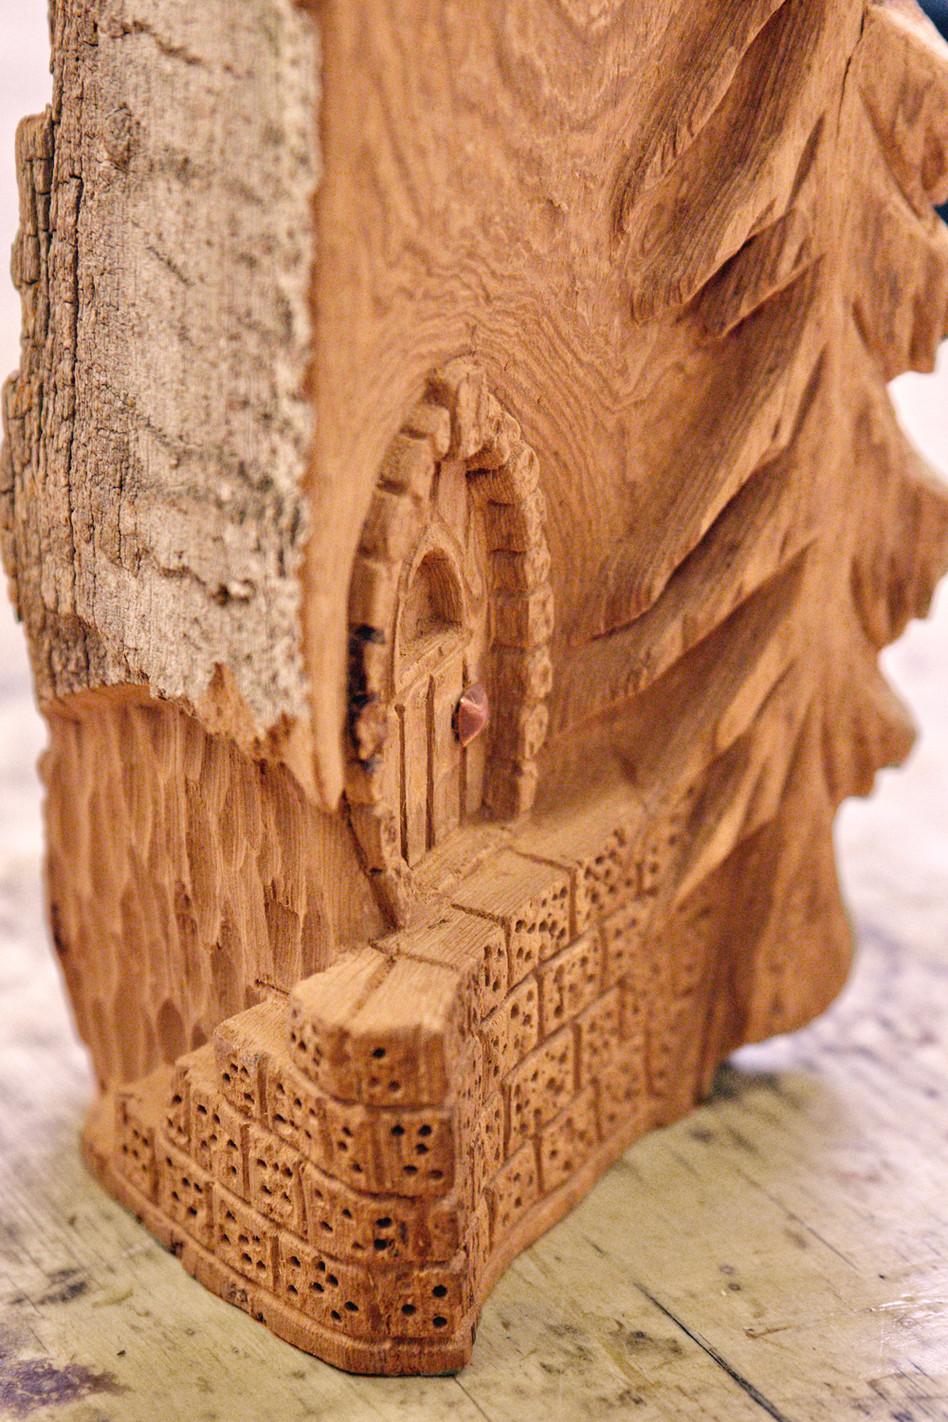 LJC-Dogwood_Carving-Close_up_door.jpg